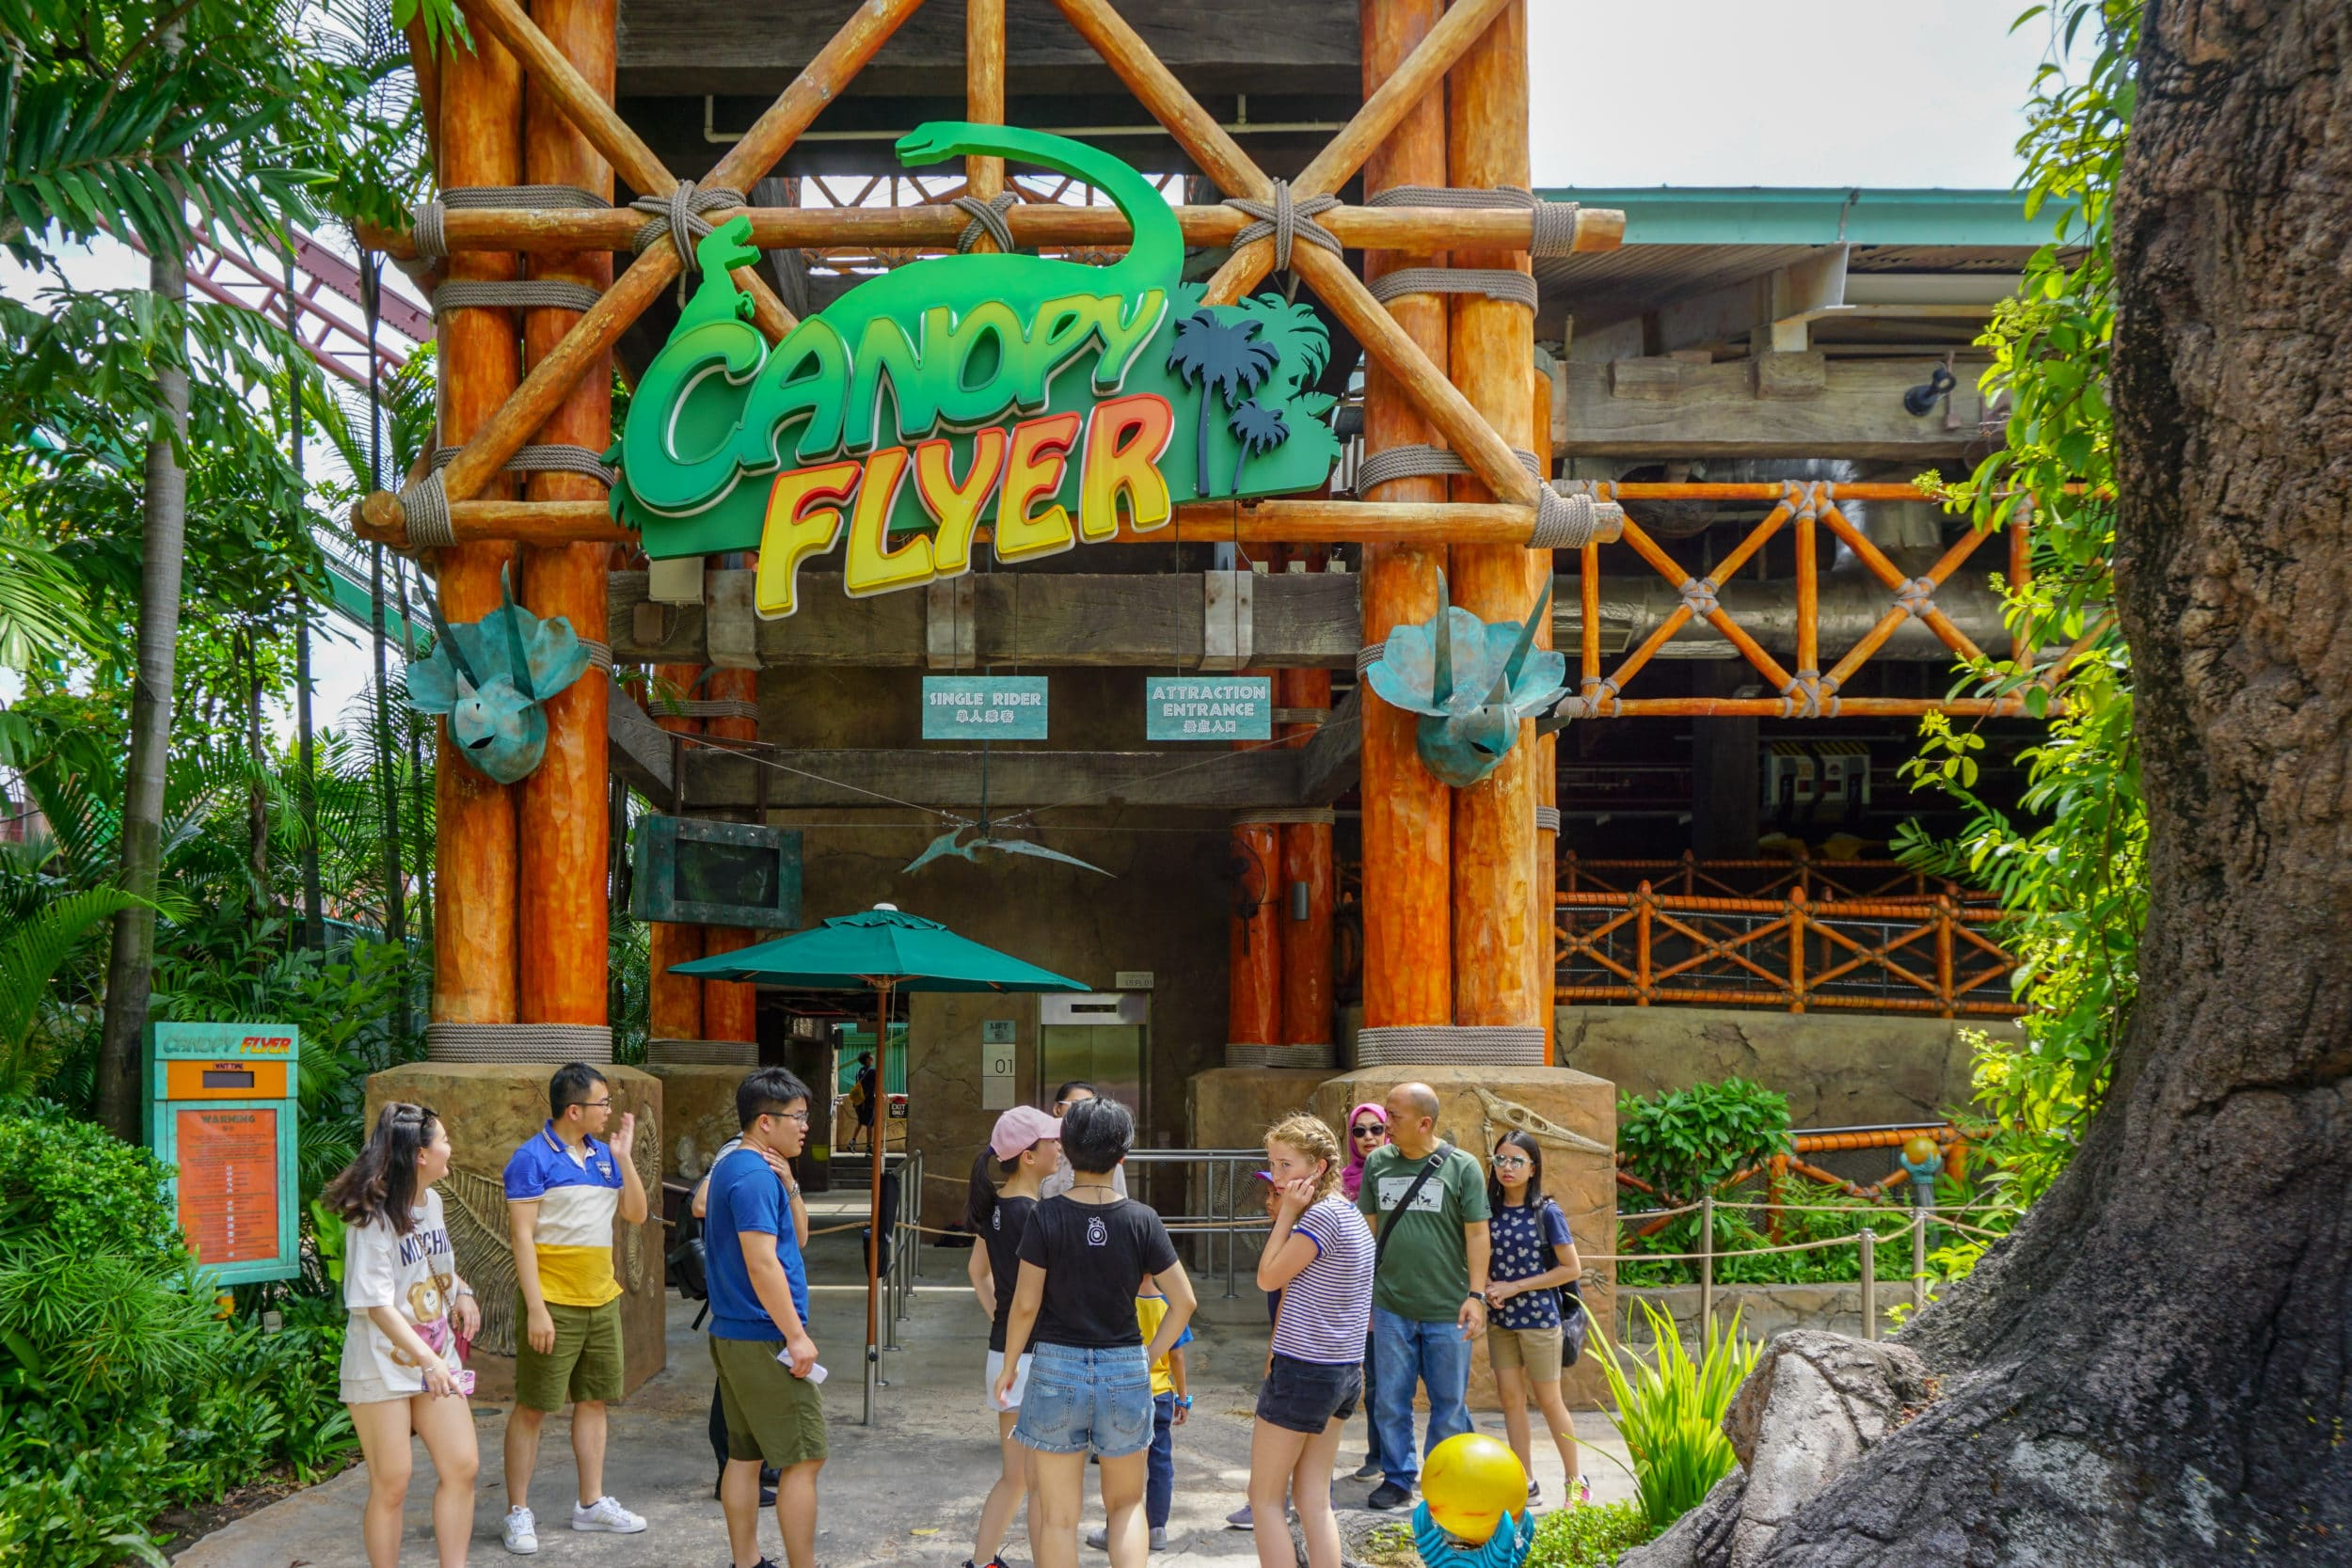 Universal Studios Singapore Canopy Flyer